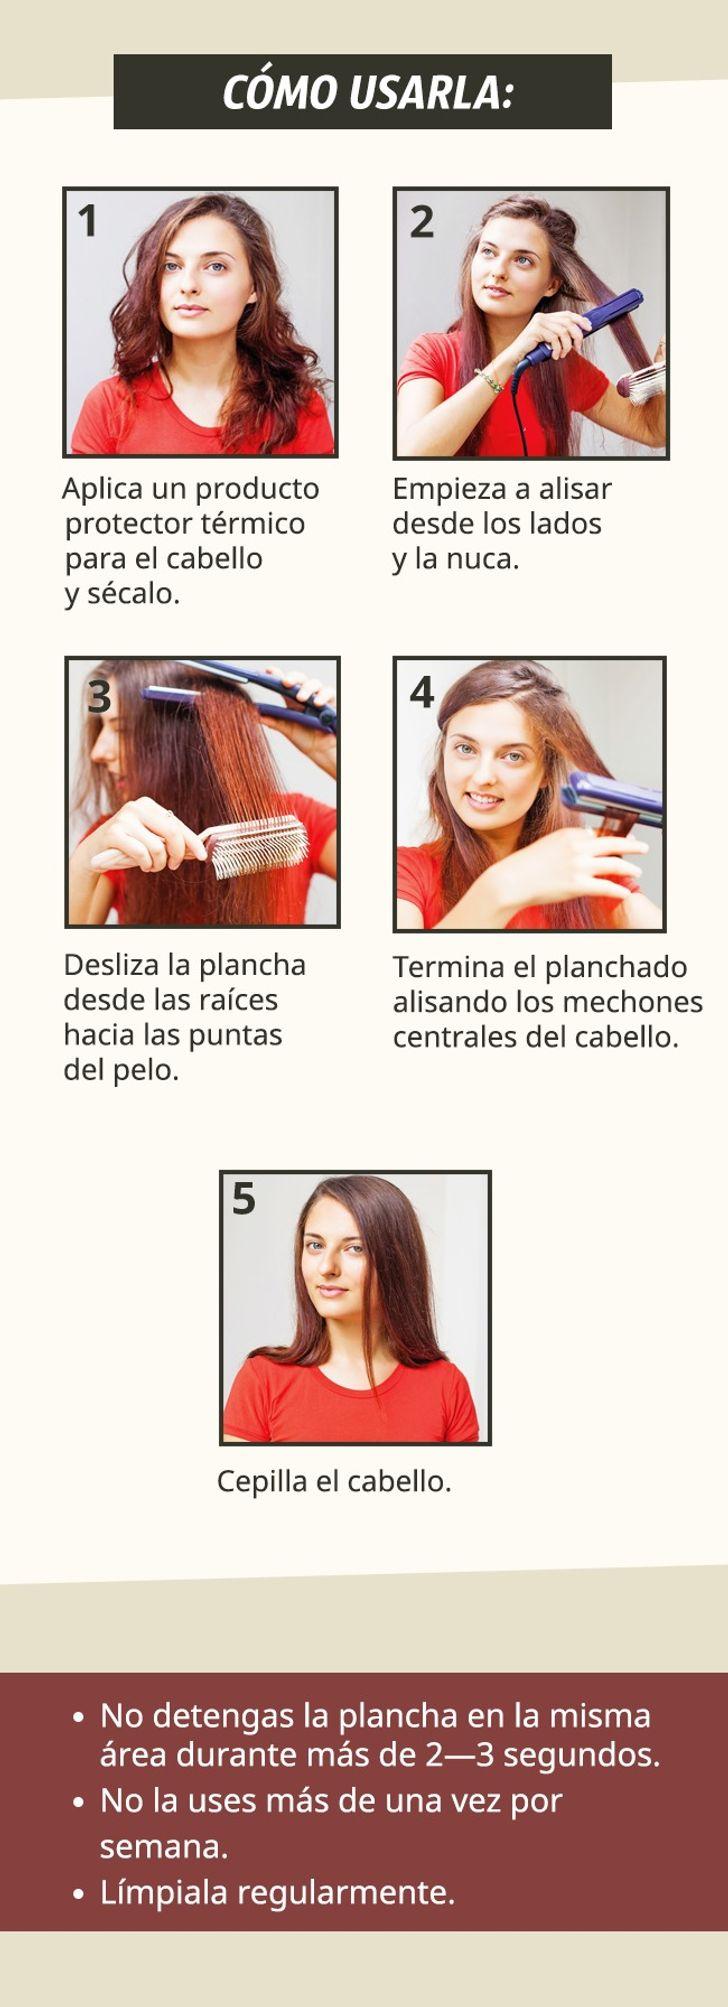 14Trucos decuidado decabello que cada chica debe saber